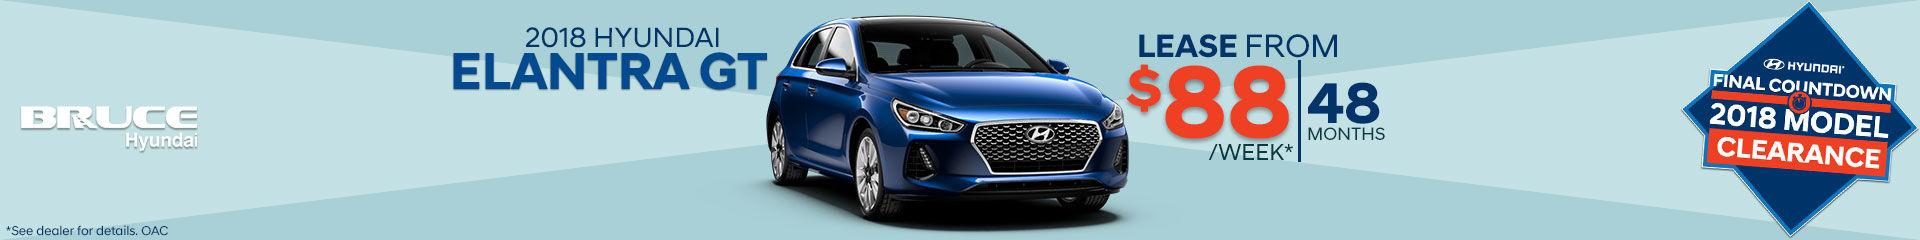 Lease the 2018 Hyundai Elantra GT